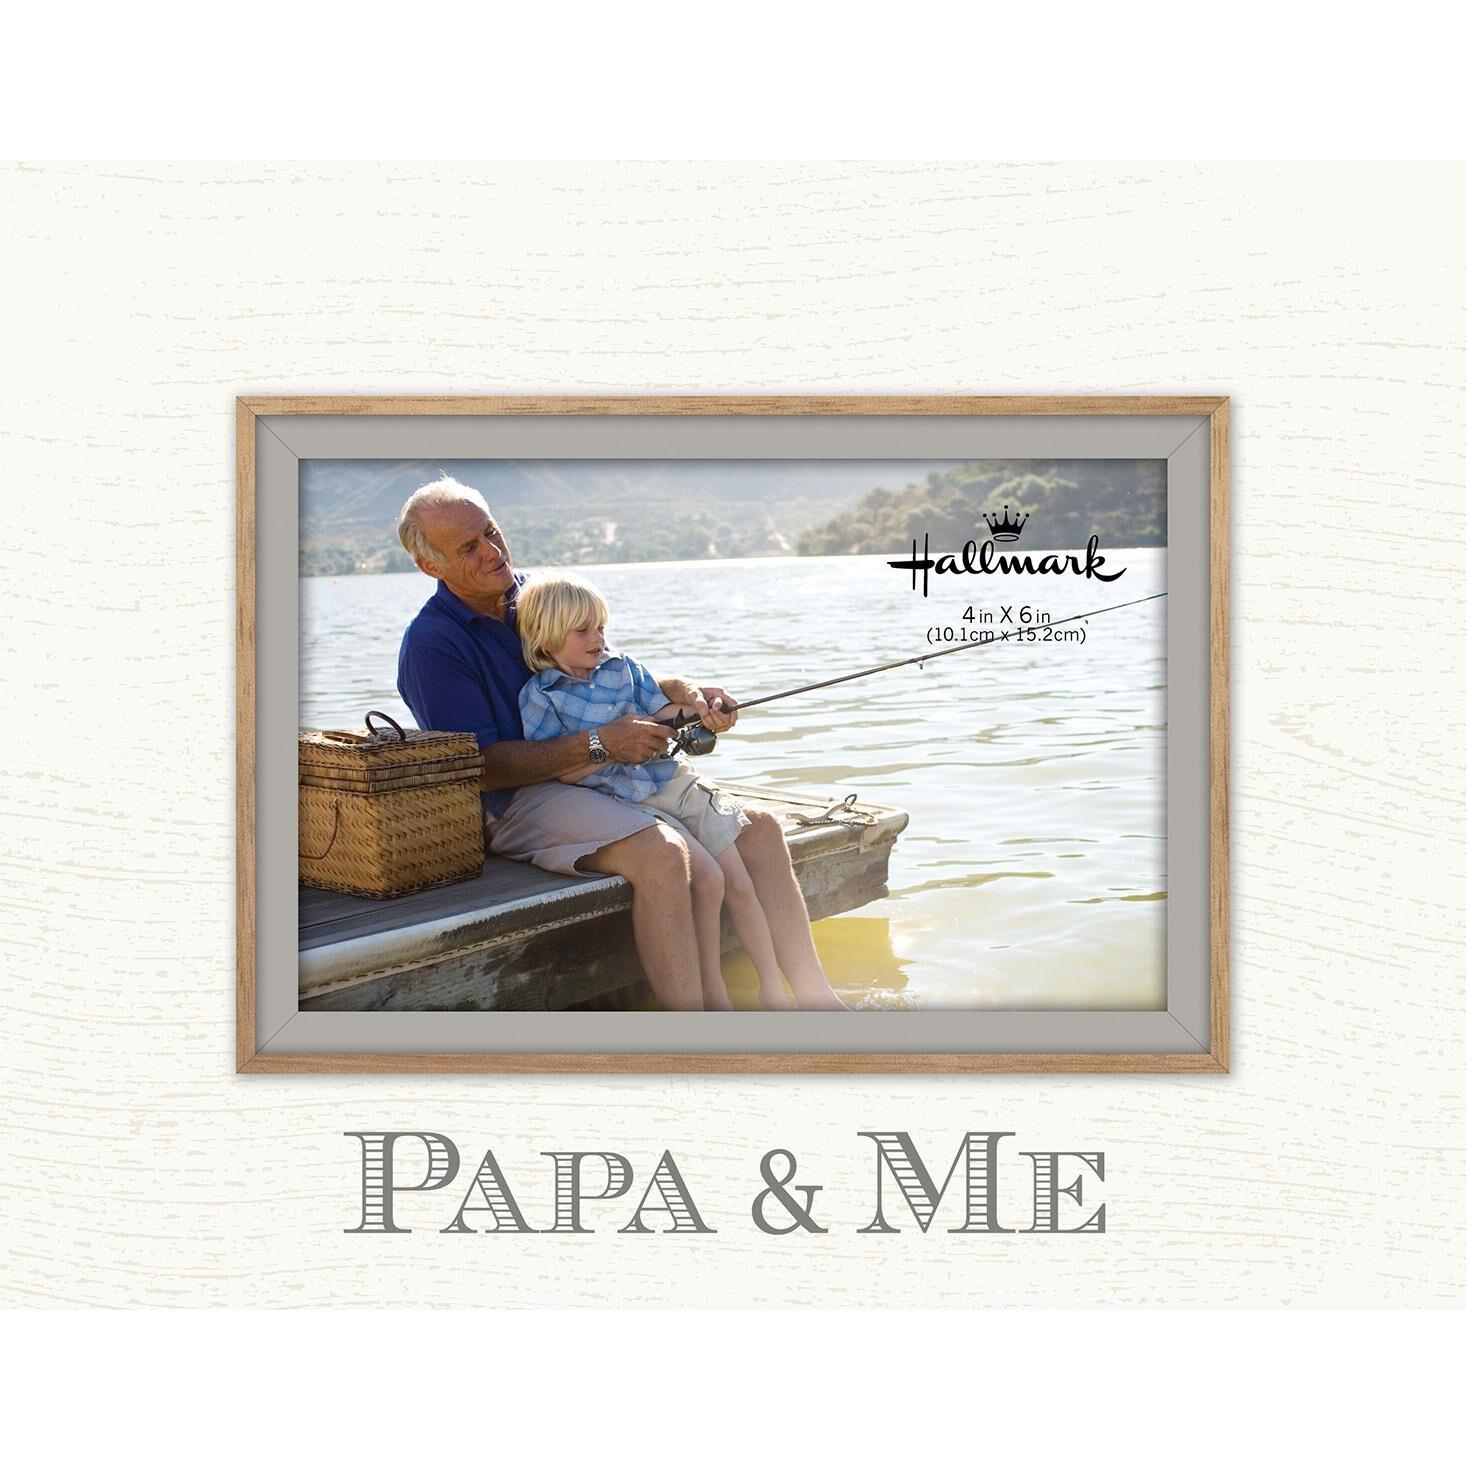 Papa & Me Malden Picture Frame, 4x6 - Picture Frames - Hallmark